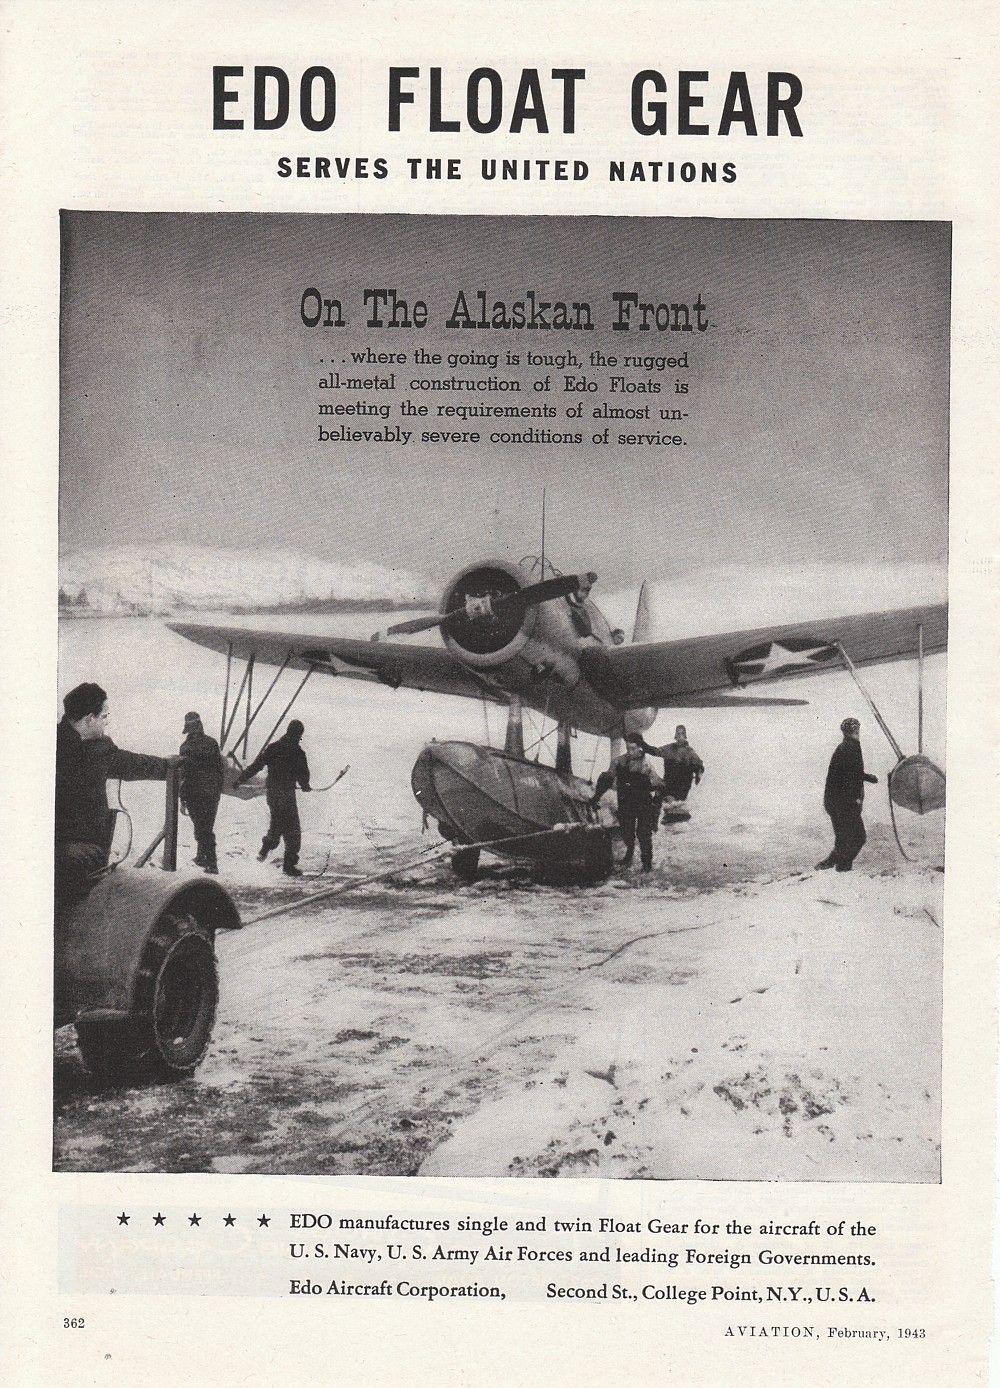 1943 Edo Float Gear magazine ad. US Navy plane on the Alaskan Front. #WWII #aviation #plane #alaska #navy Source: 1943 Aviation magazine.